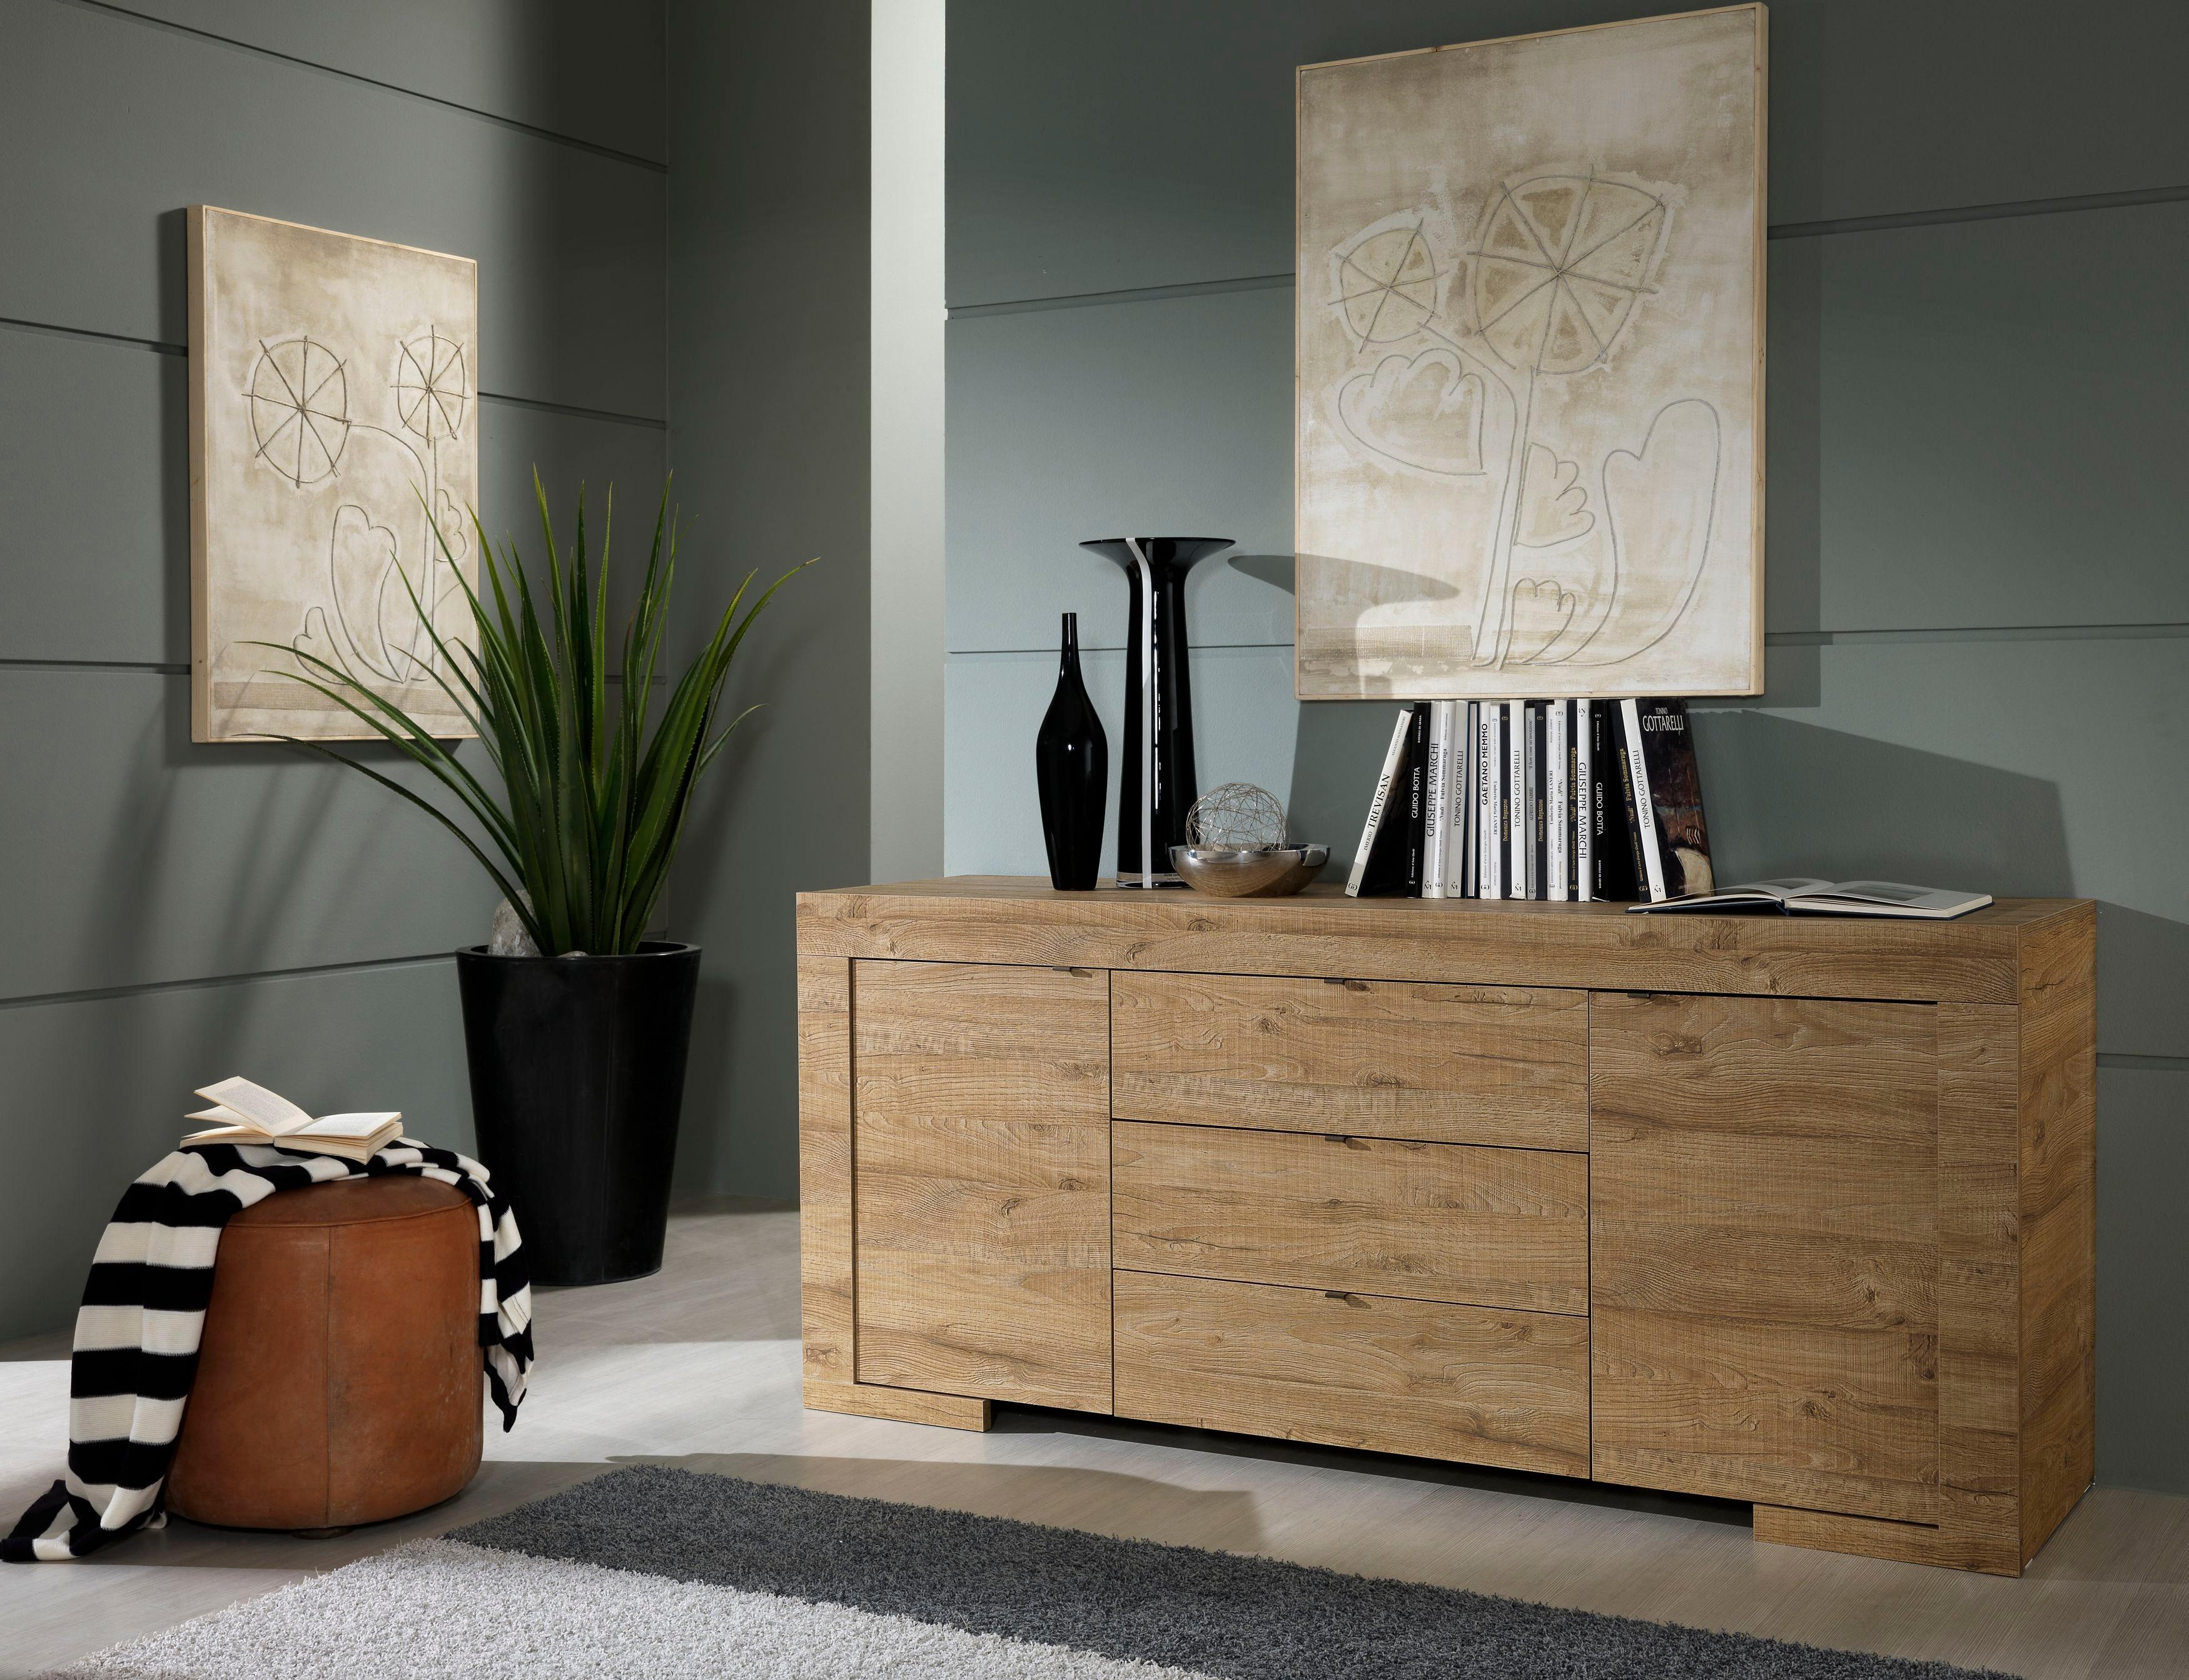 LC dressoir Milano Breedte 191 cm online kopen op otto.nl